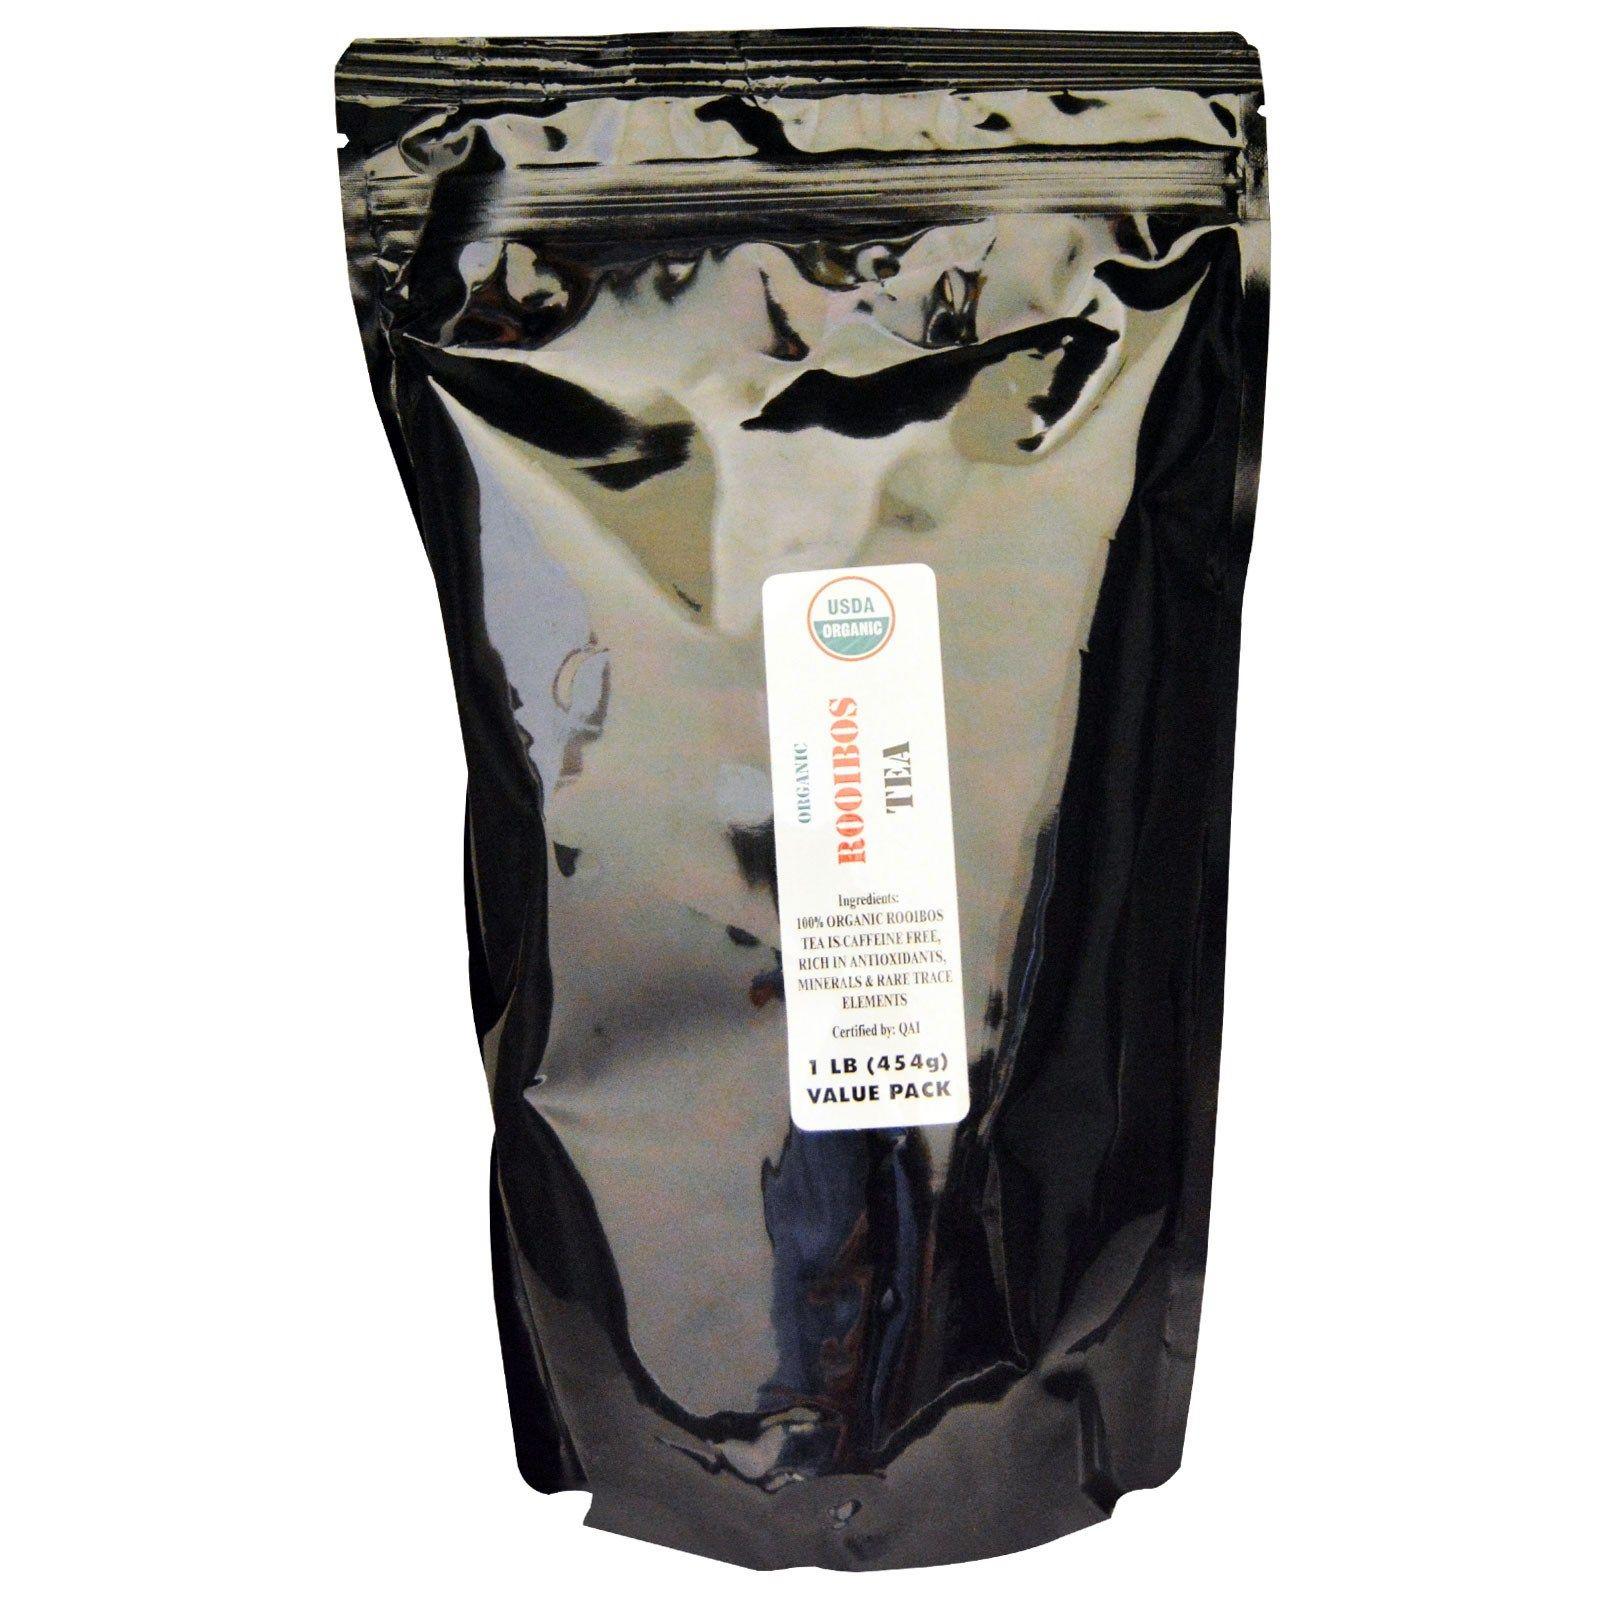 J&R Port Trading Co., Organic Rooibos Tea, Caffeine Free